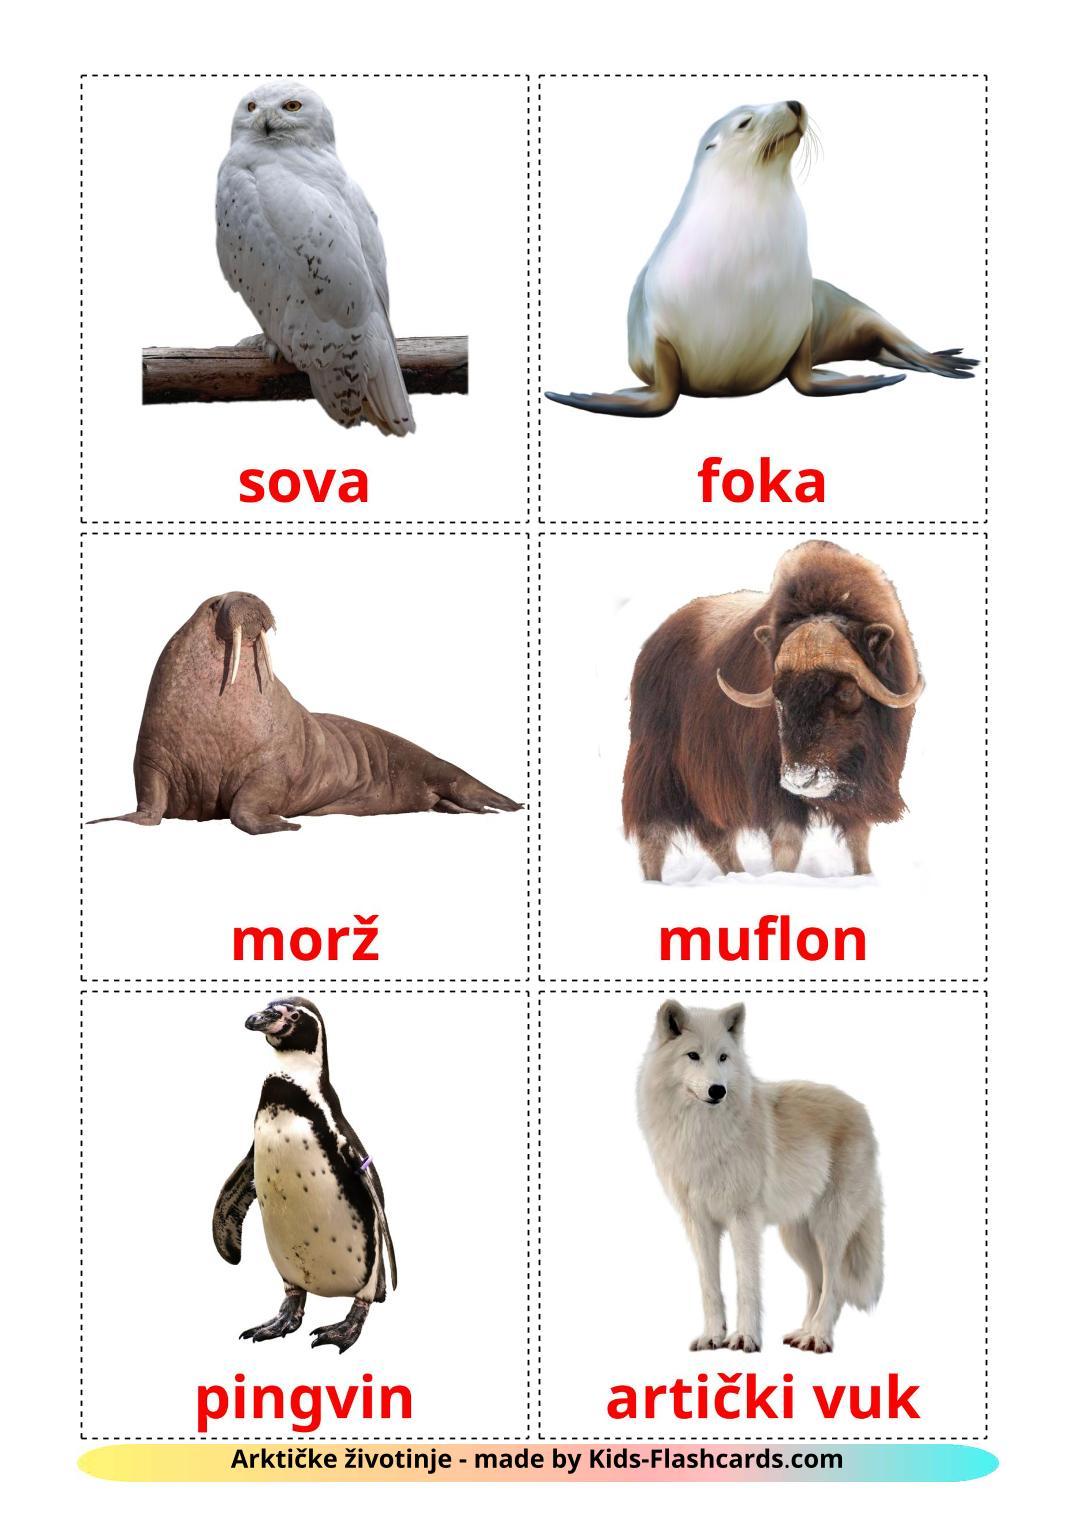 Arctic animals - 14 Free Printable croatian Flashcards